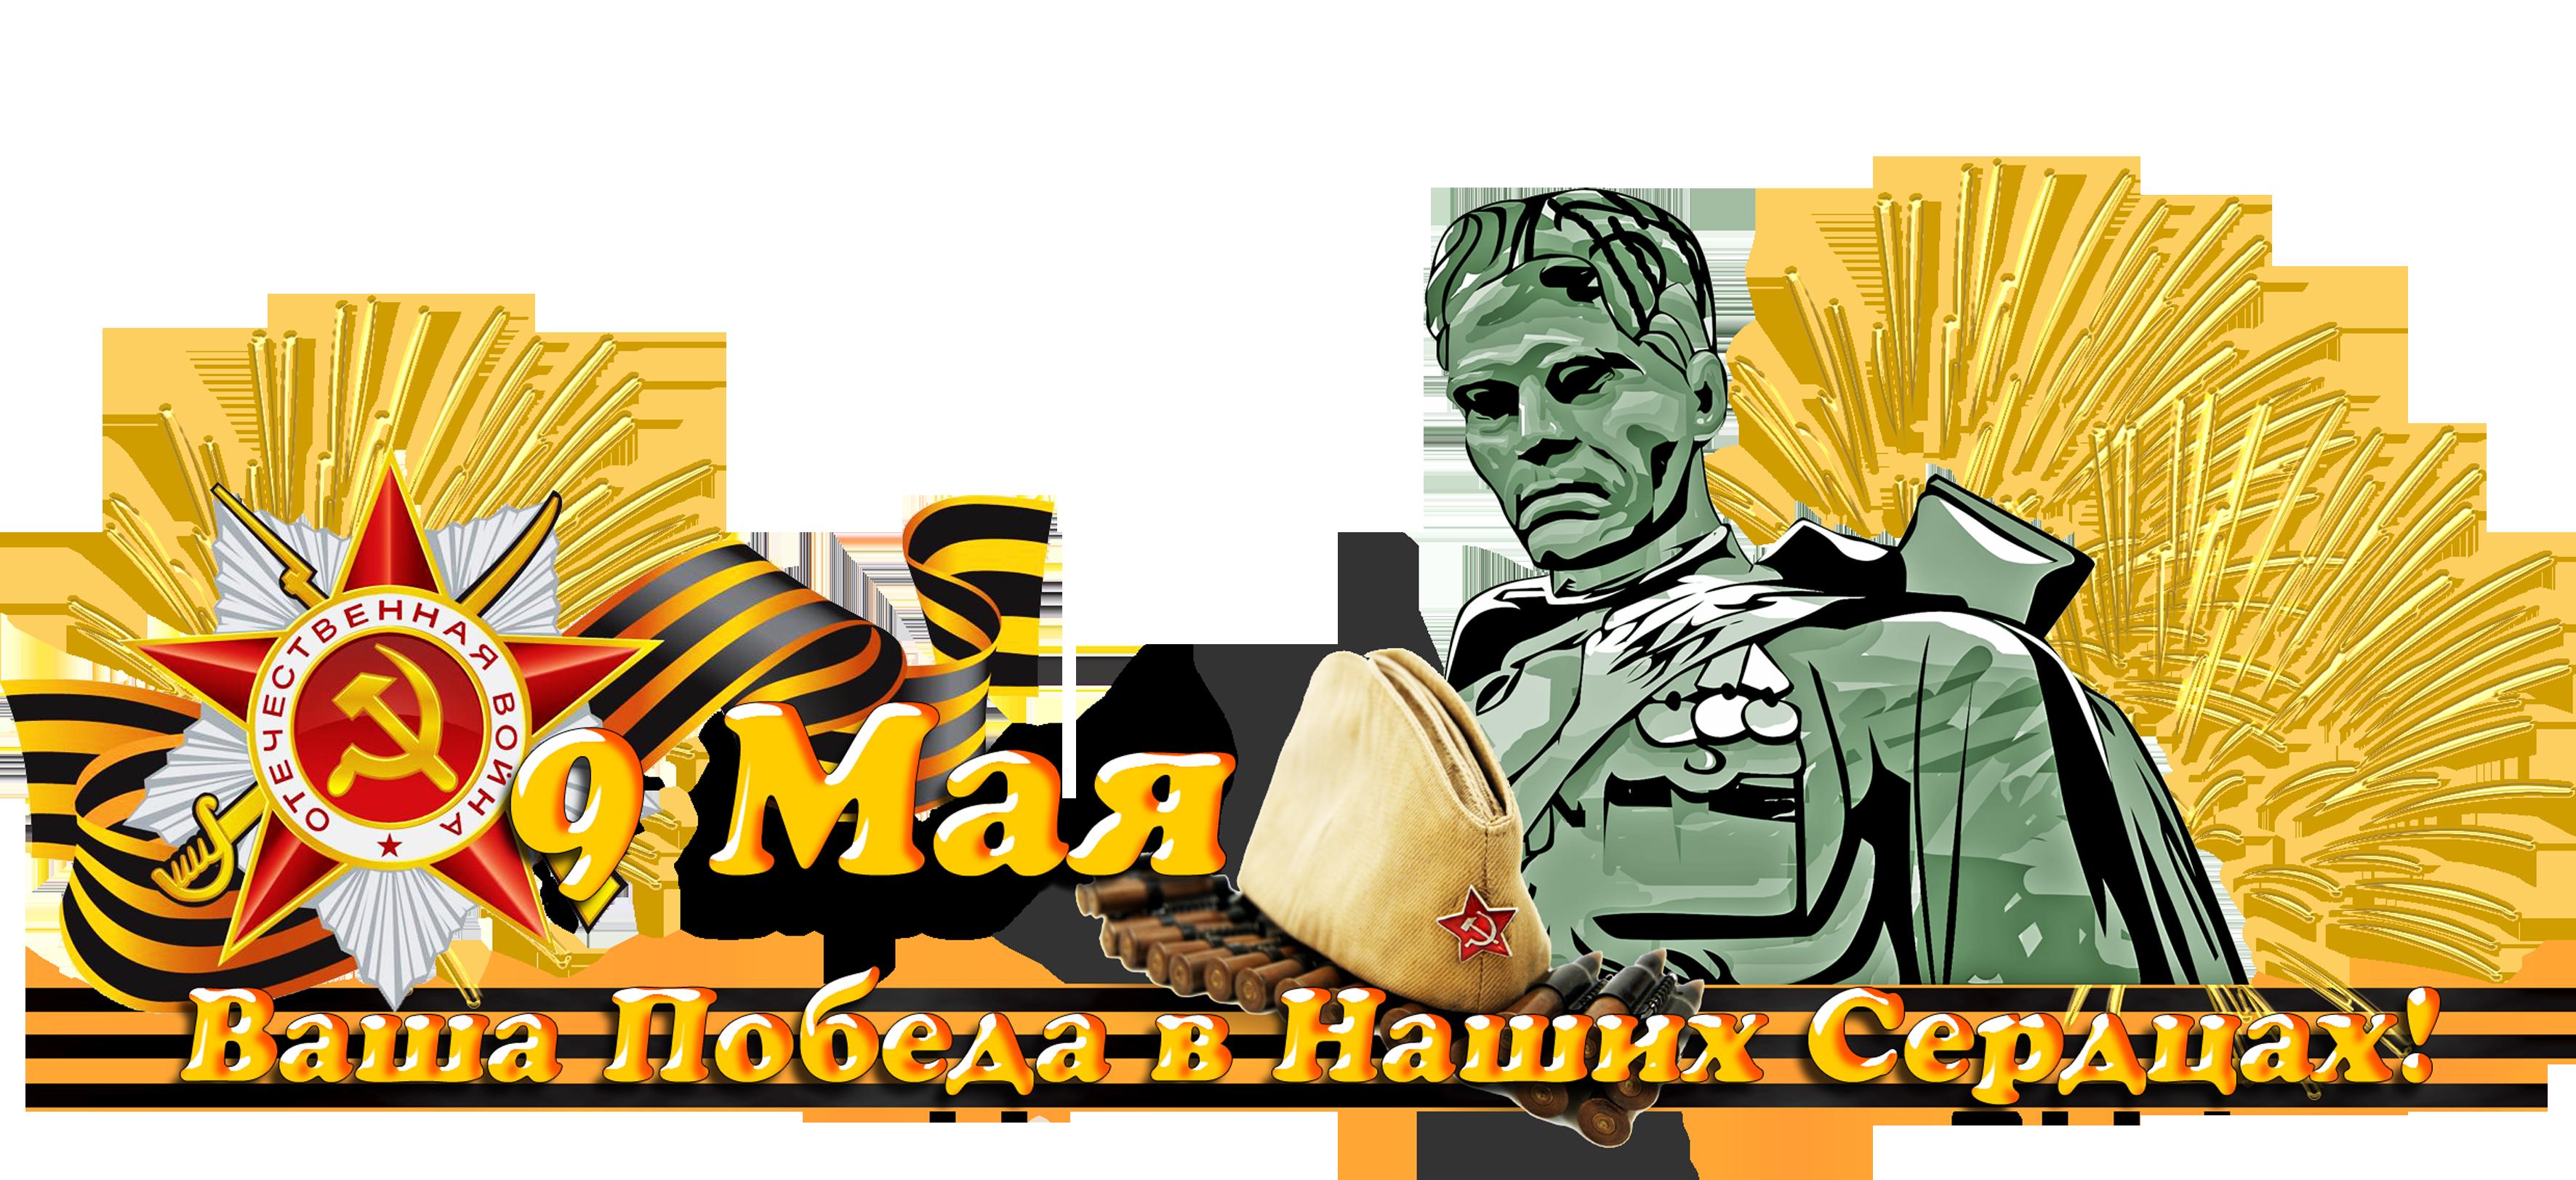 http://www.ds100nezabudka.ru/pics/deny_pobedi000001.png